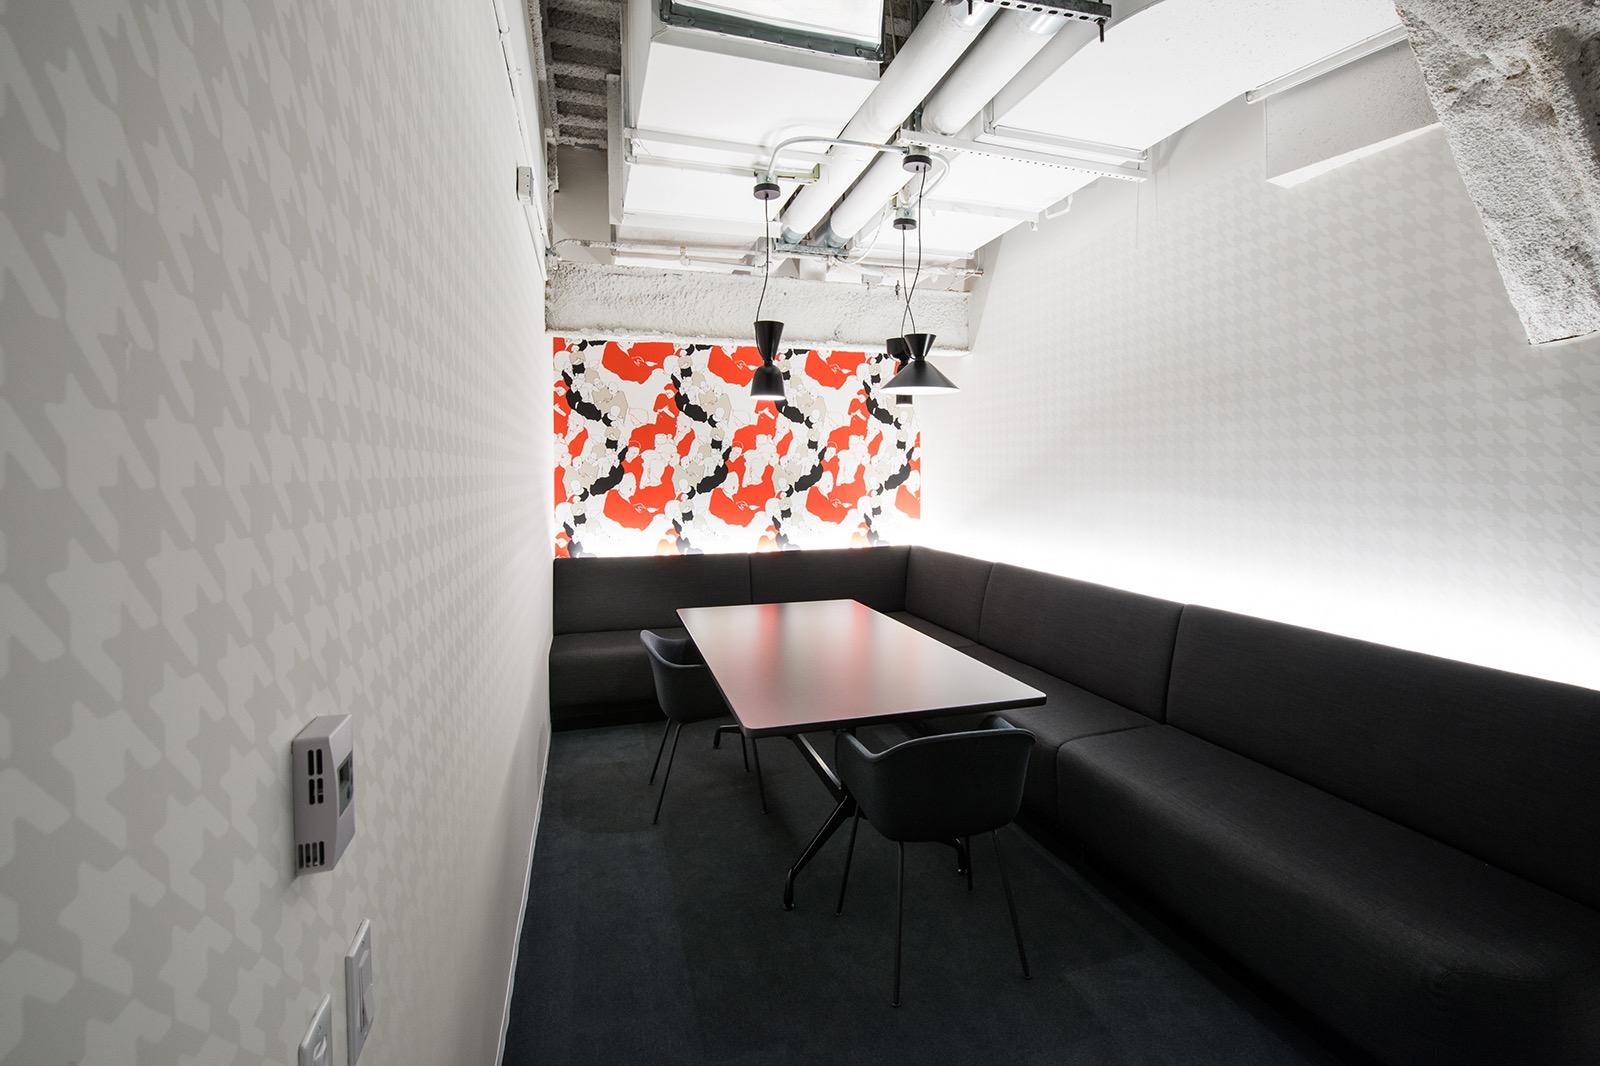 vox-media-nyc-office-13